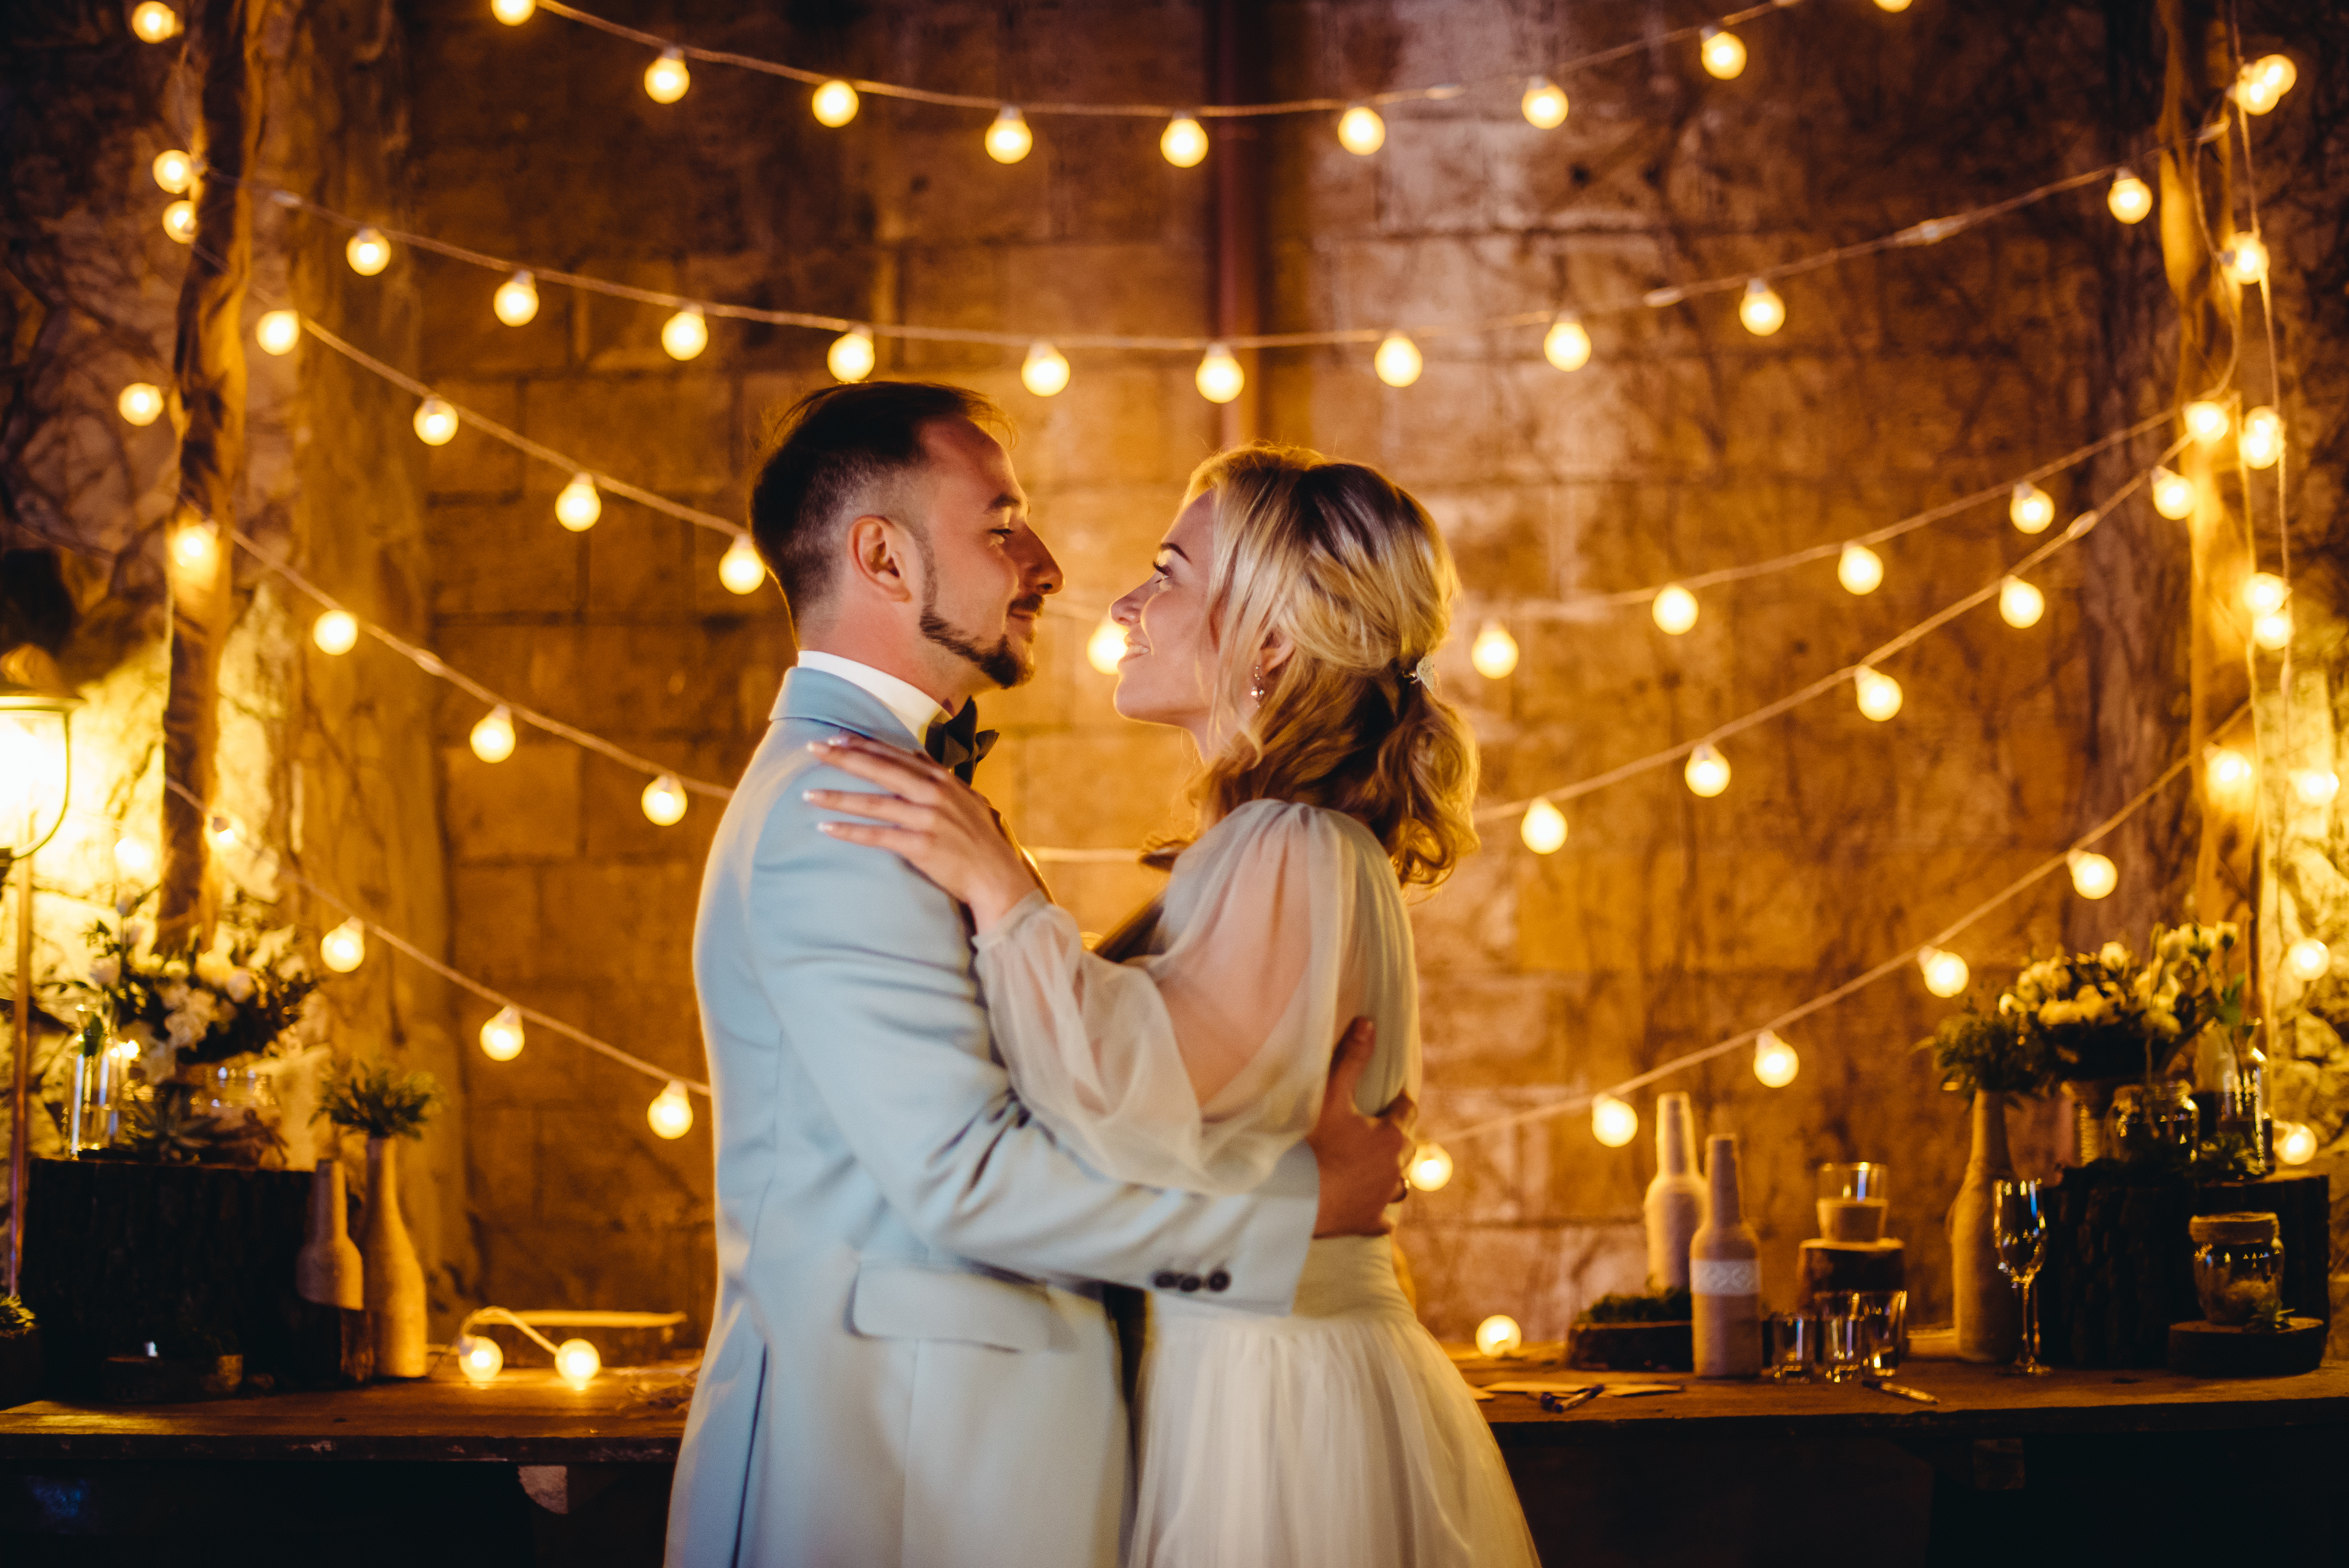 фотозона свадьба